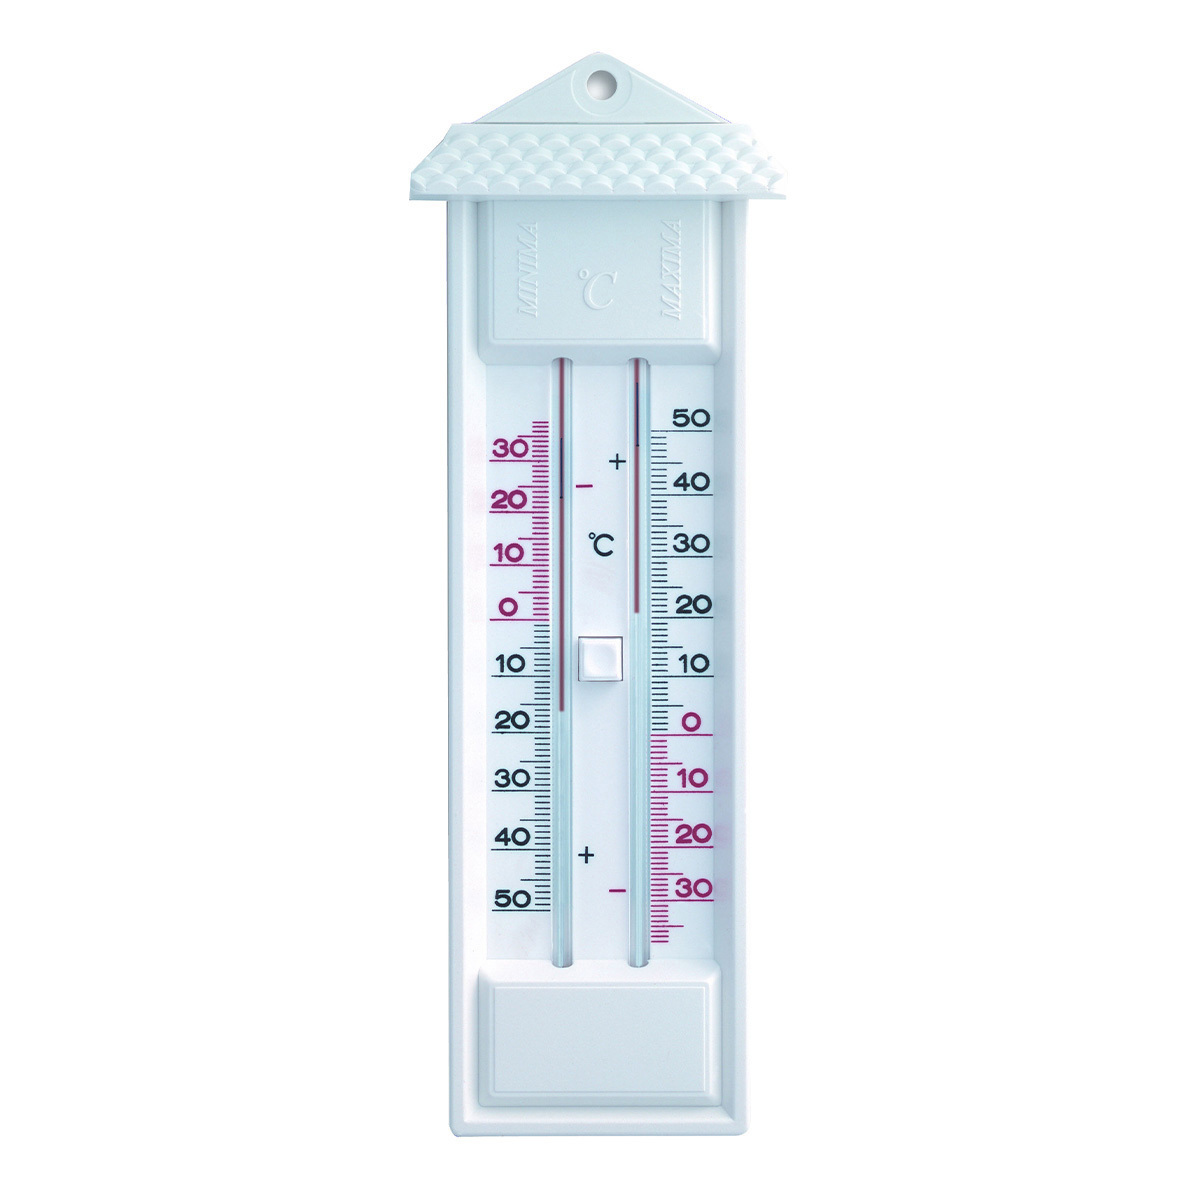 10-3014-02-analoges-minima-maxima-thermometer-1200x1200px.jpg